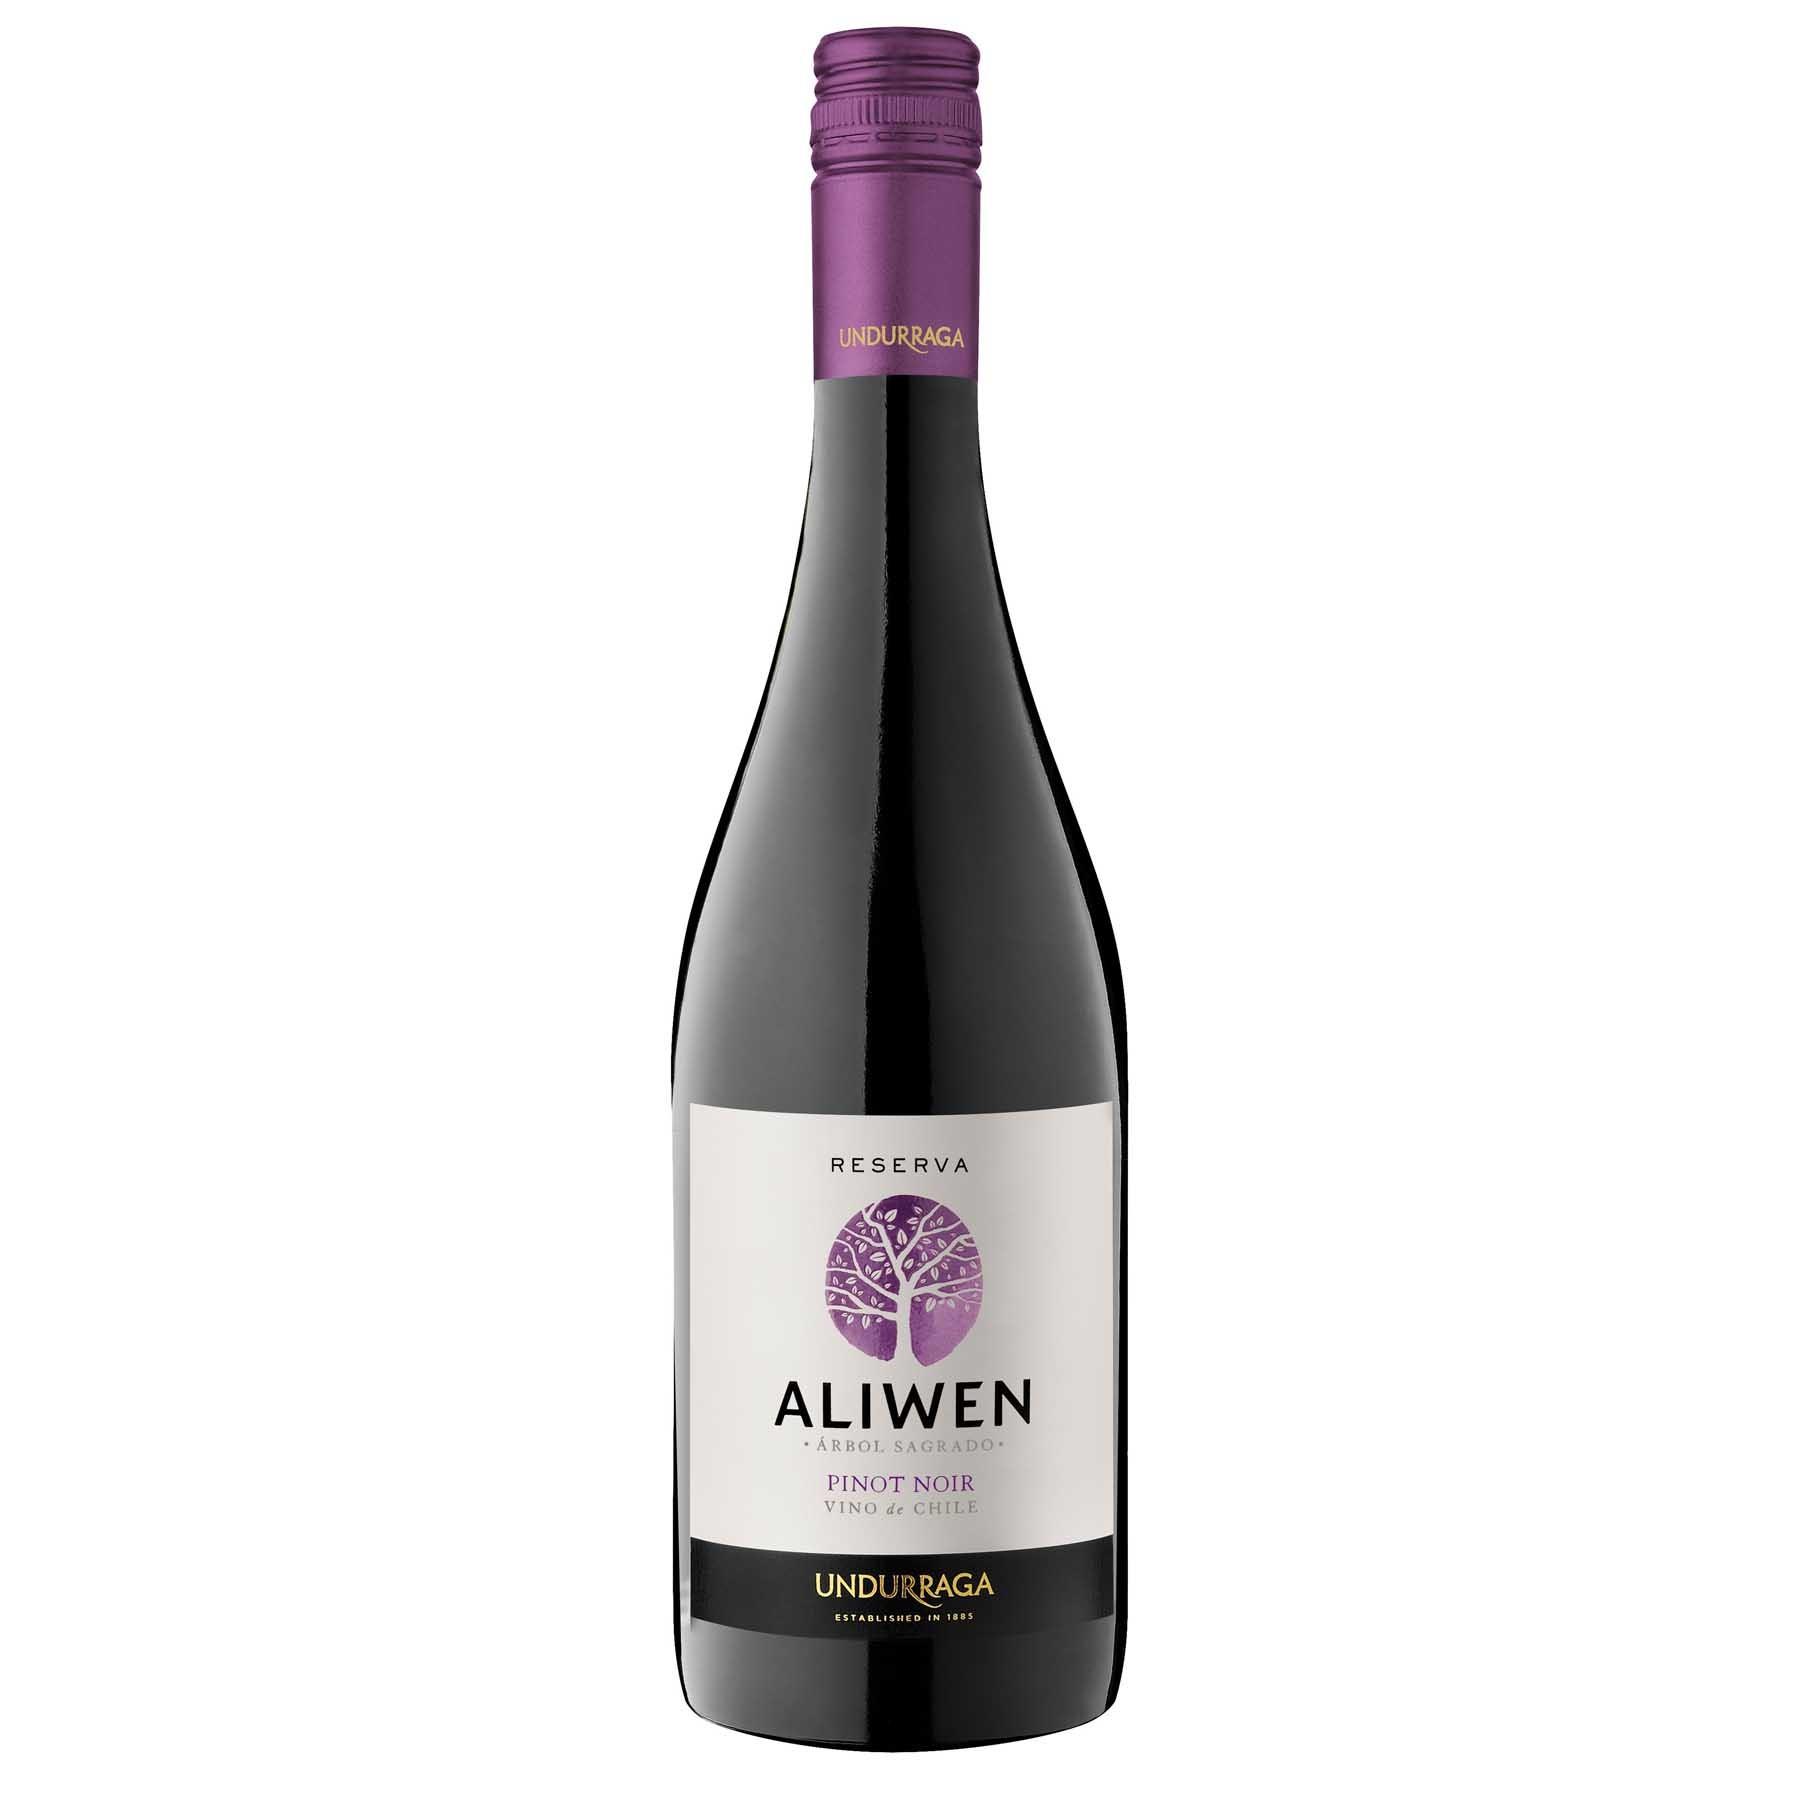 Vinho Tinto Chileno Undurraga Aliwen Reserva Pinot Noir 2014